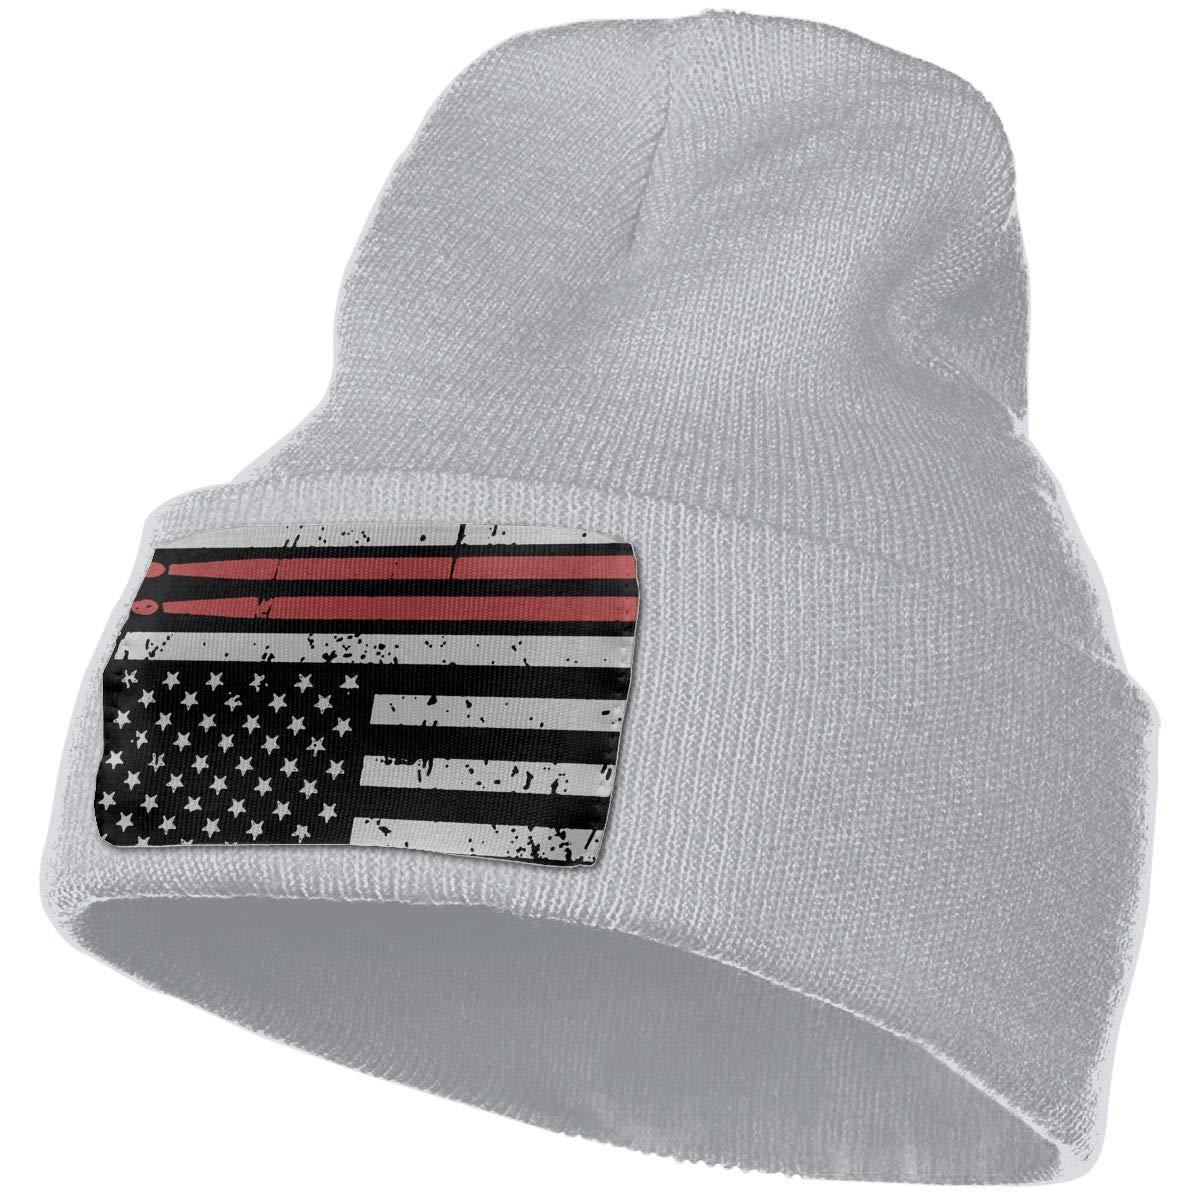 DFKD JKFD Unisex 3D Knitted Hat Skull Hat Beanie Cap Drummers American Flag